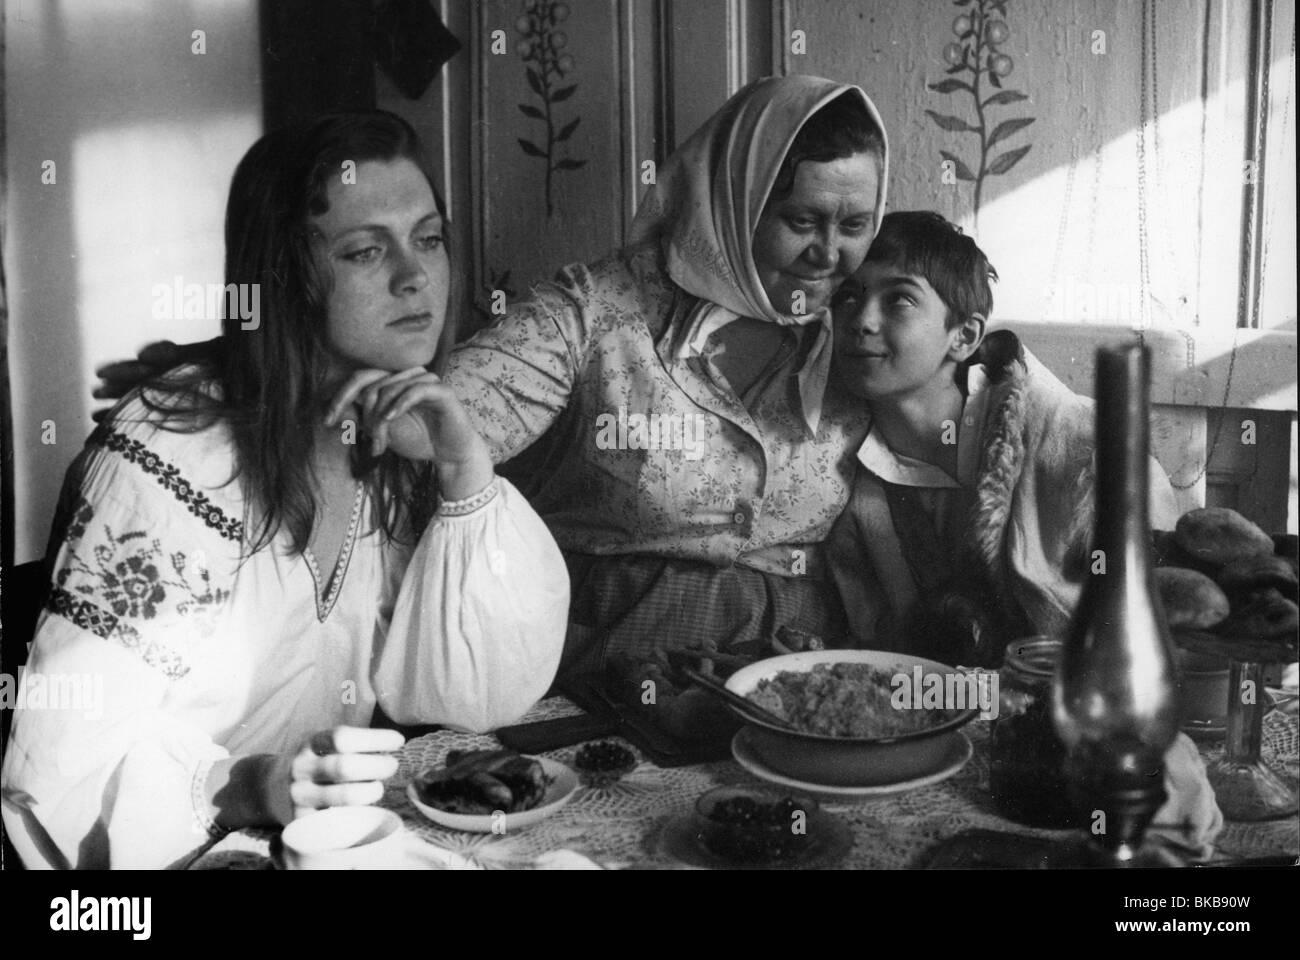 Detskiy trauriges Jahr: 1983 Direktor: Jewgeni Jewtuschenko Galina Stakhanova, Sergei Gusak Stockbild